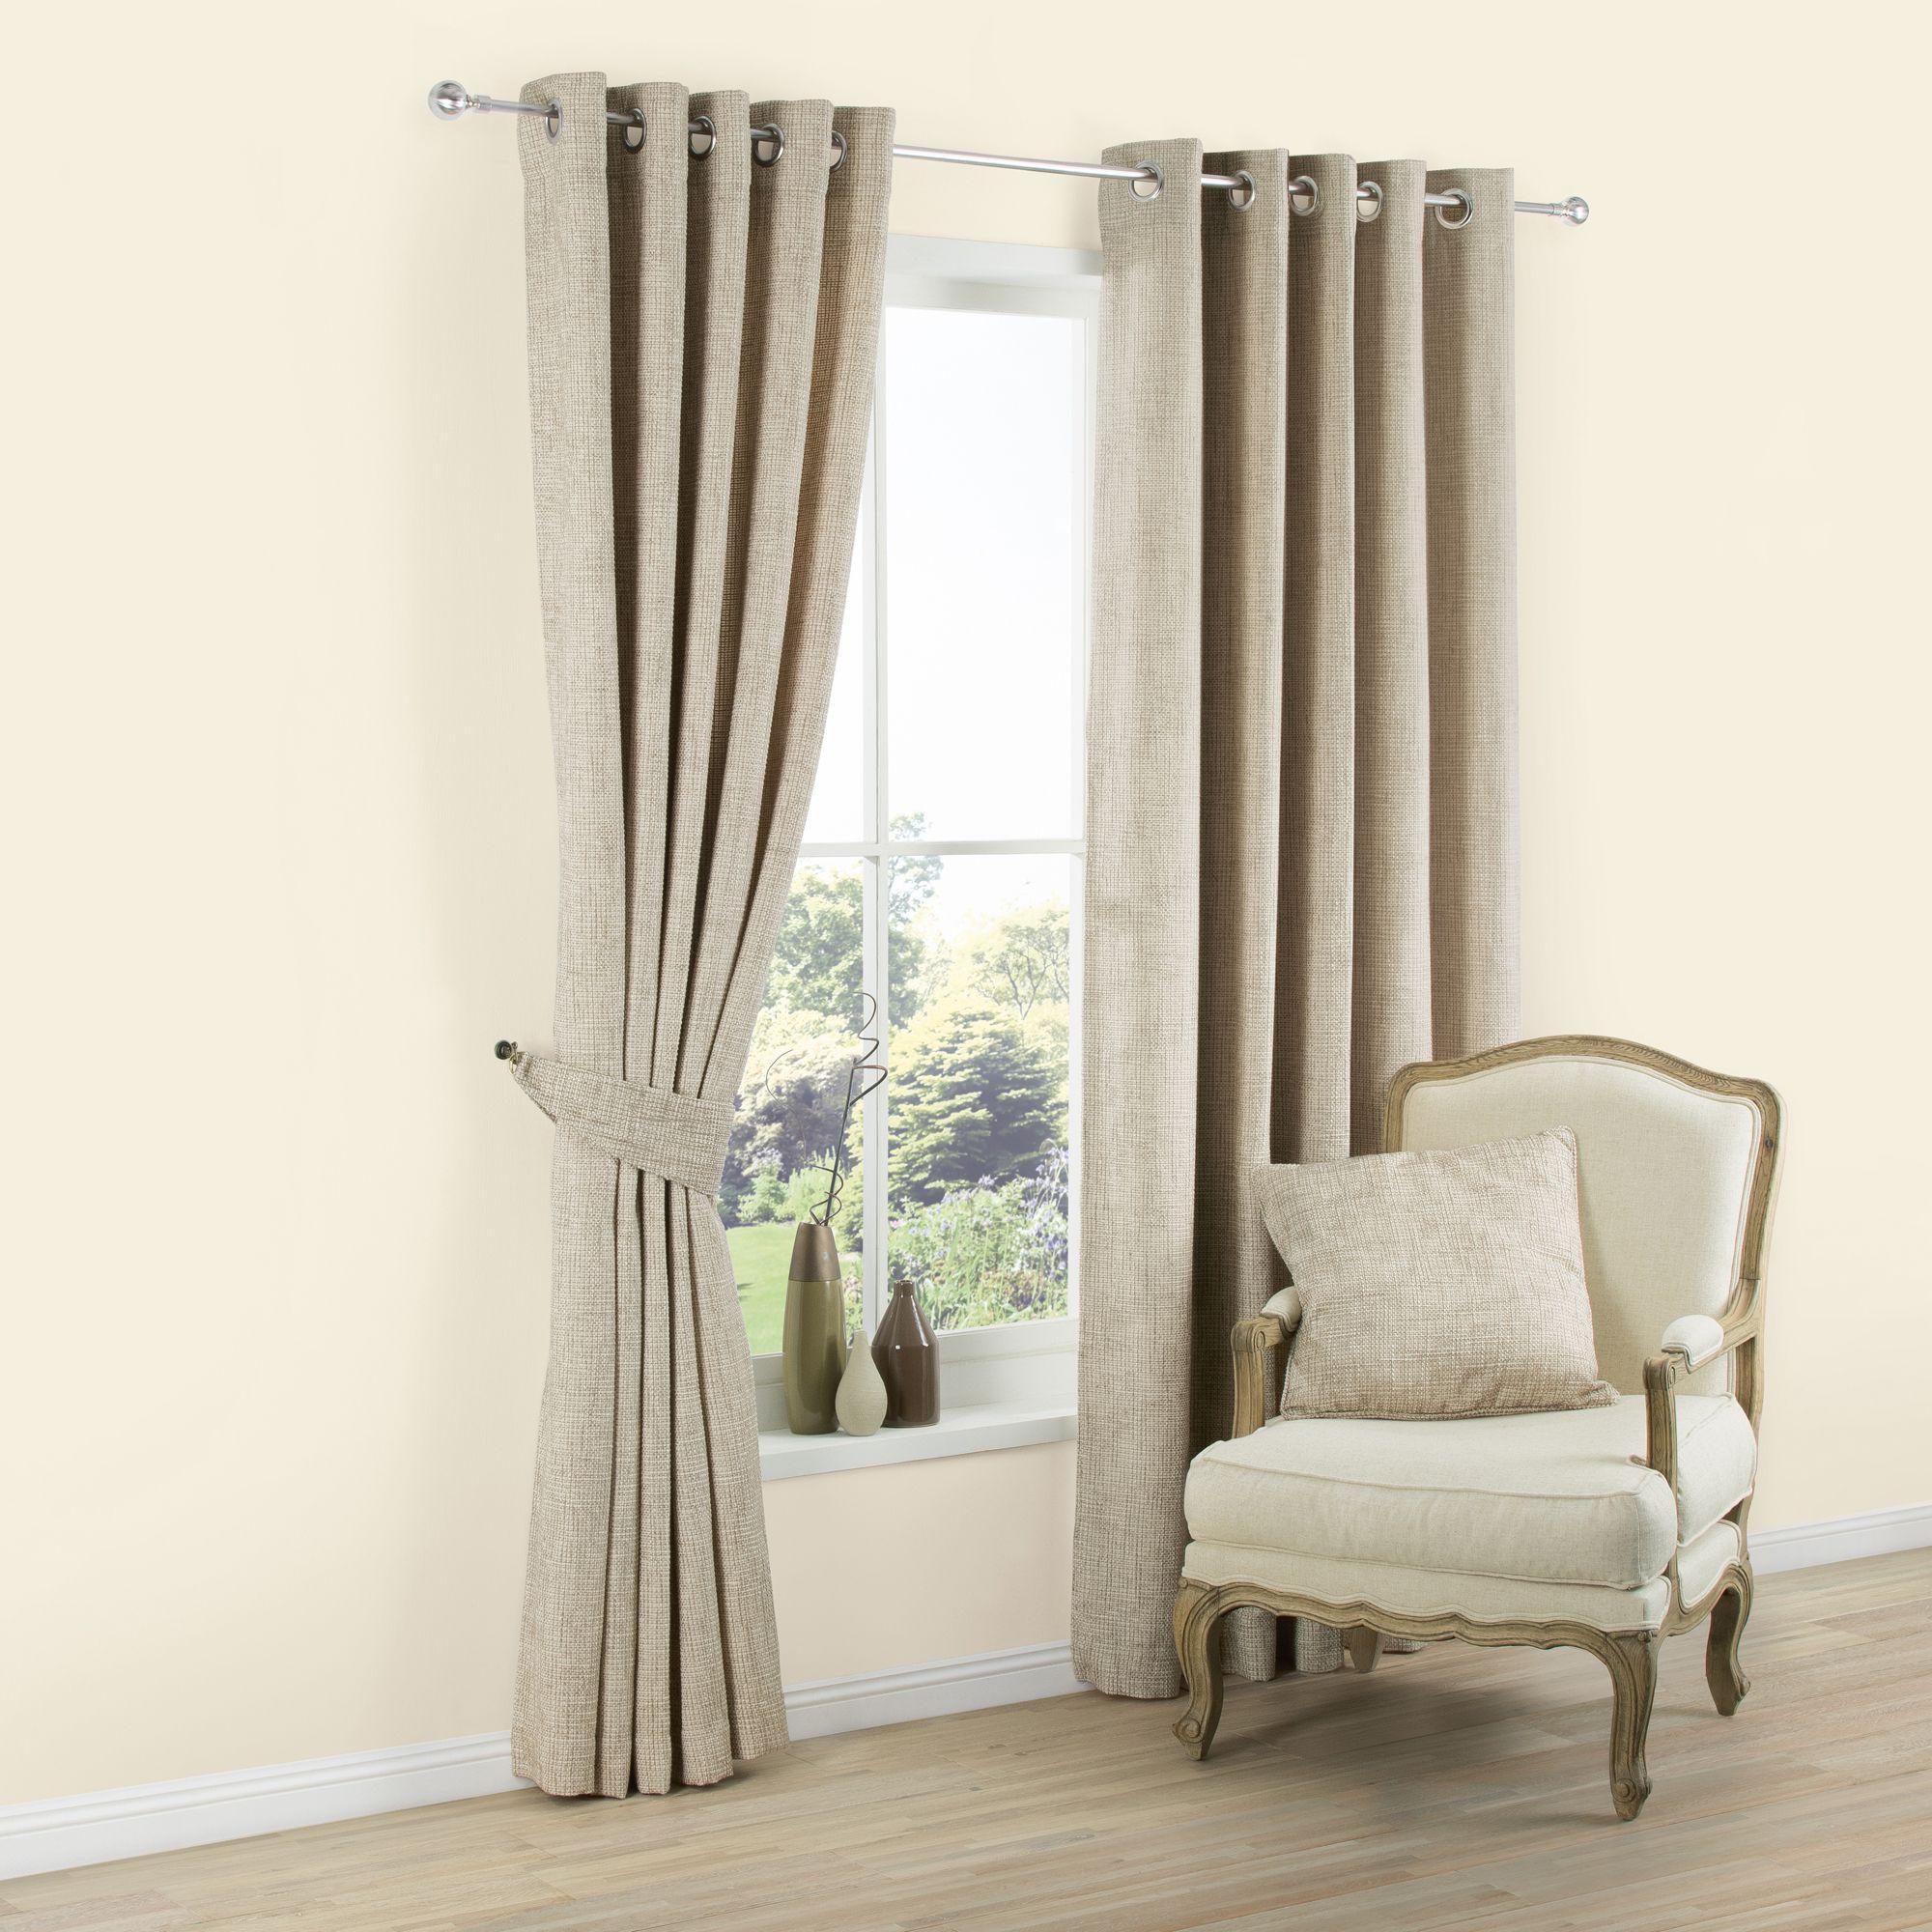 Carina Ecru & Seine Plain Woven Eyelet Lined Curtains (w)167 Cm (l)228 Cm